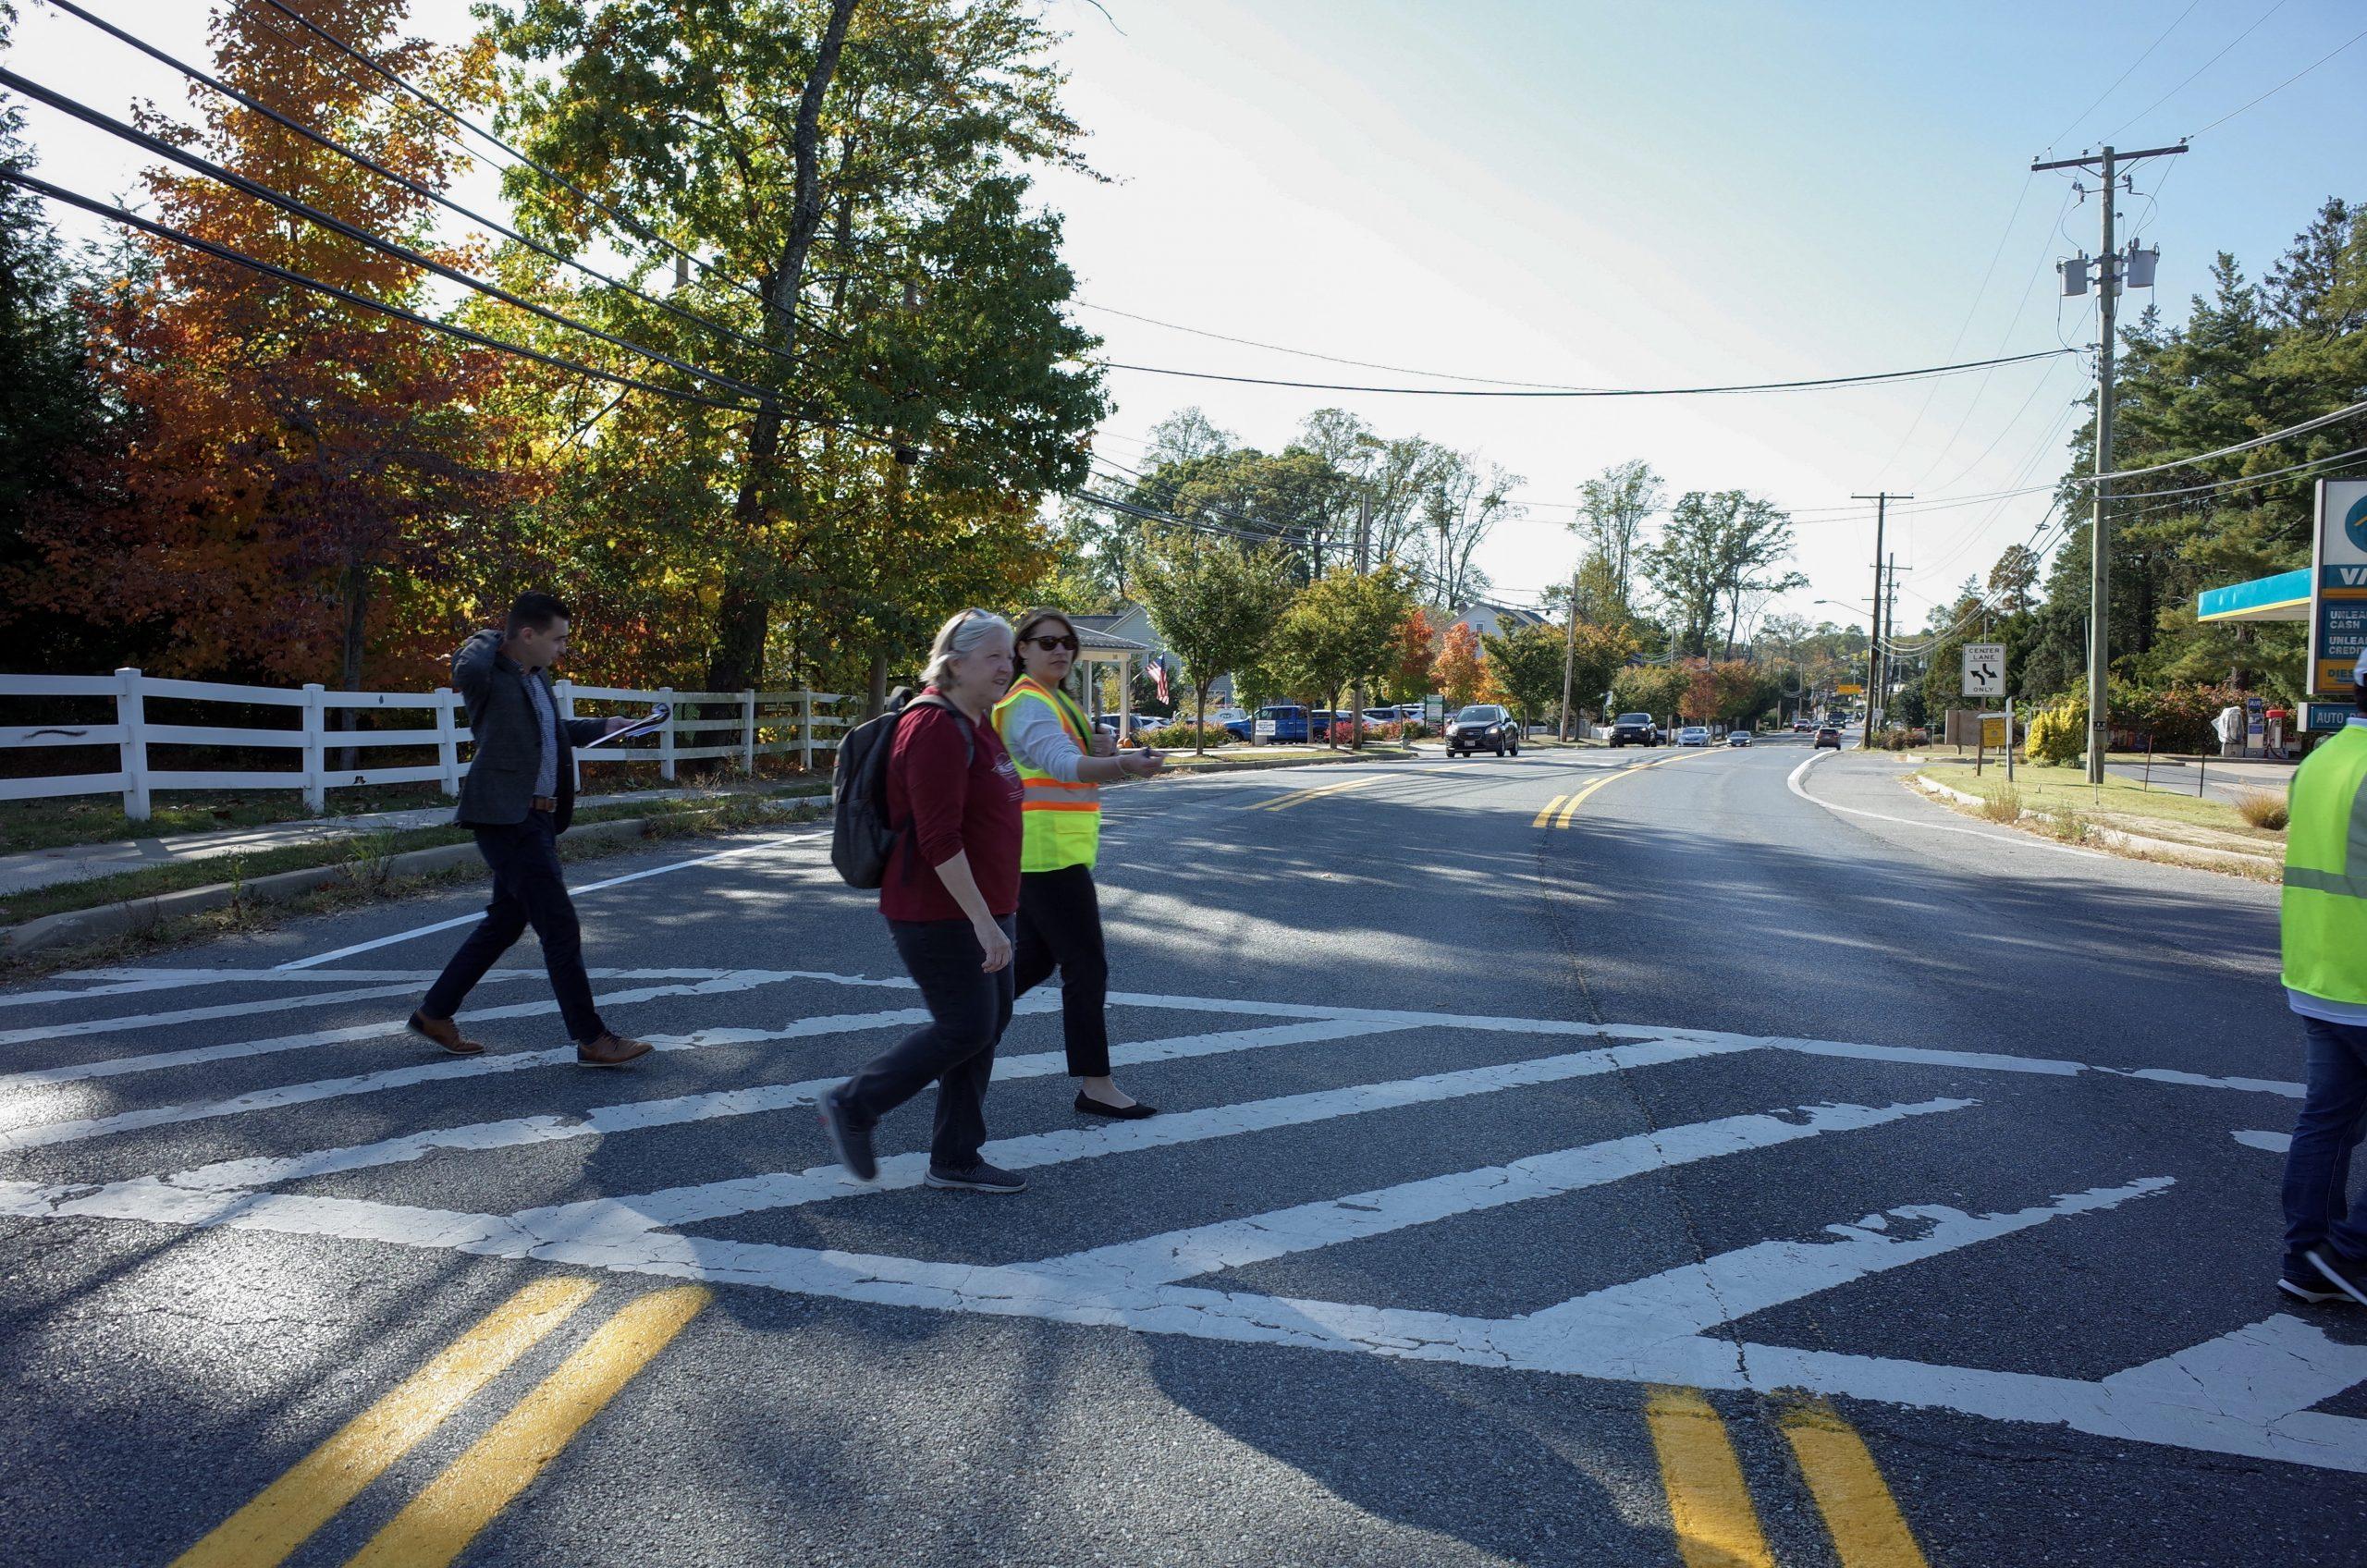 Ashton pedestrian audit participants cross Olney-Sandy Spring Road using a marked crosswalk